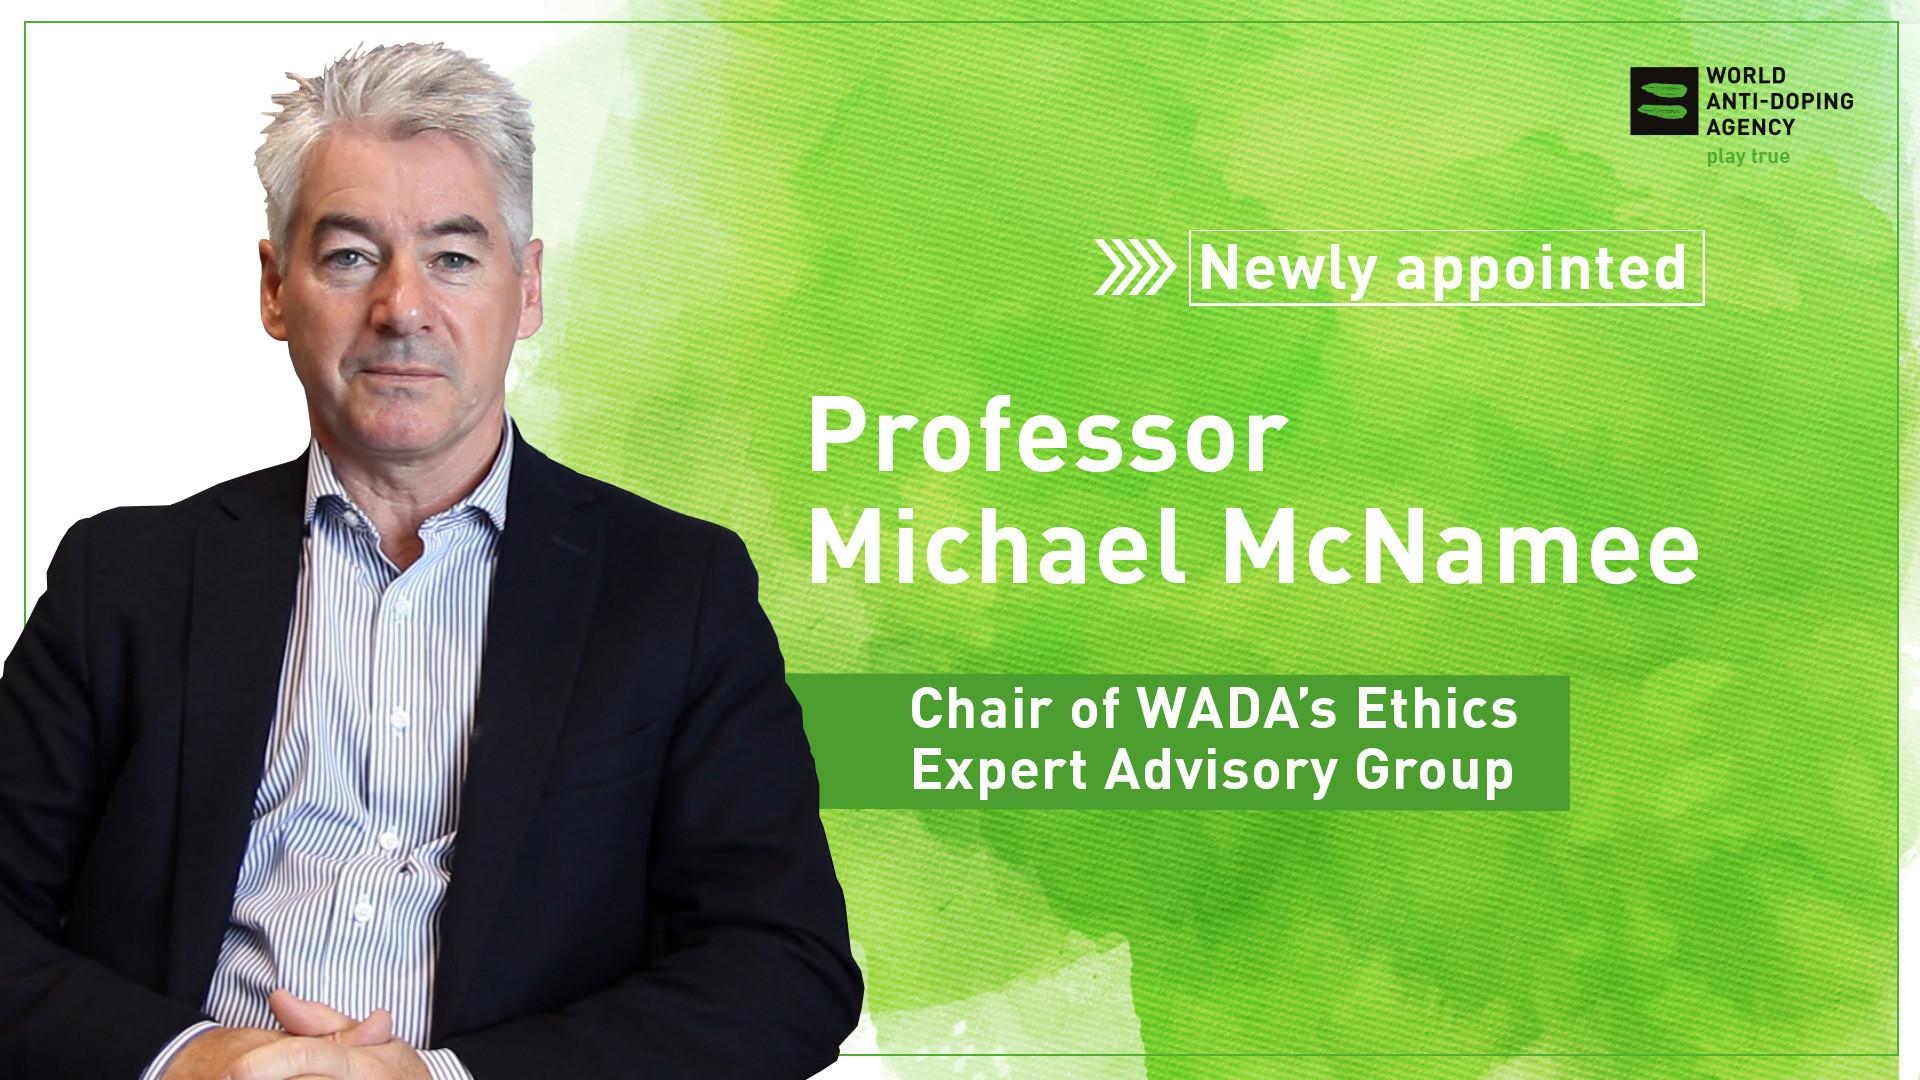 McNamee named chair of WADA Ethics Expert Advisory Group